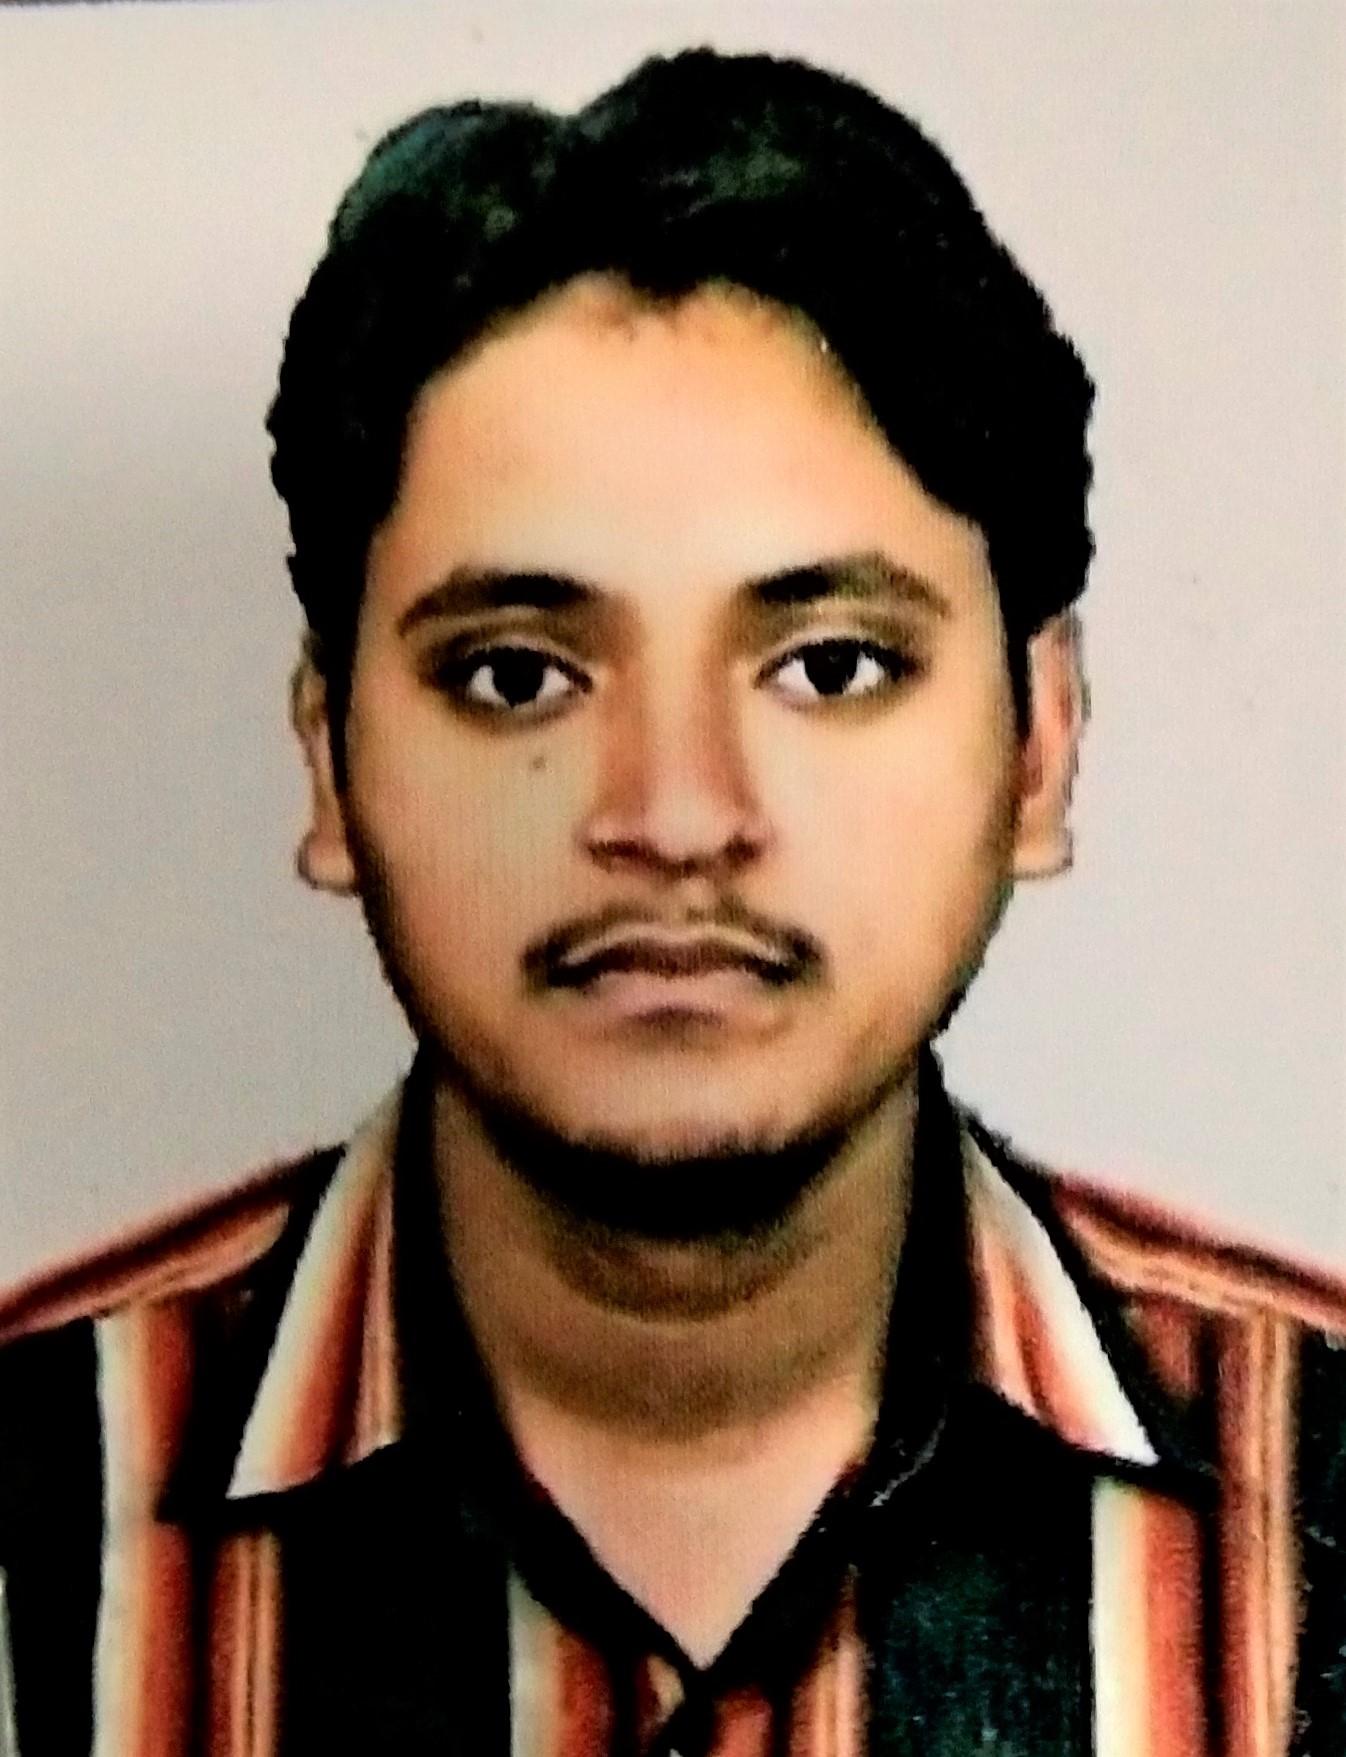 MR. SIDDHI NARAYAN BHATT